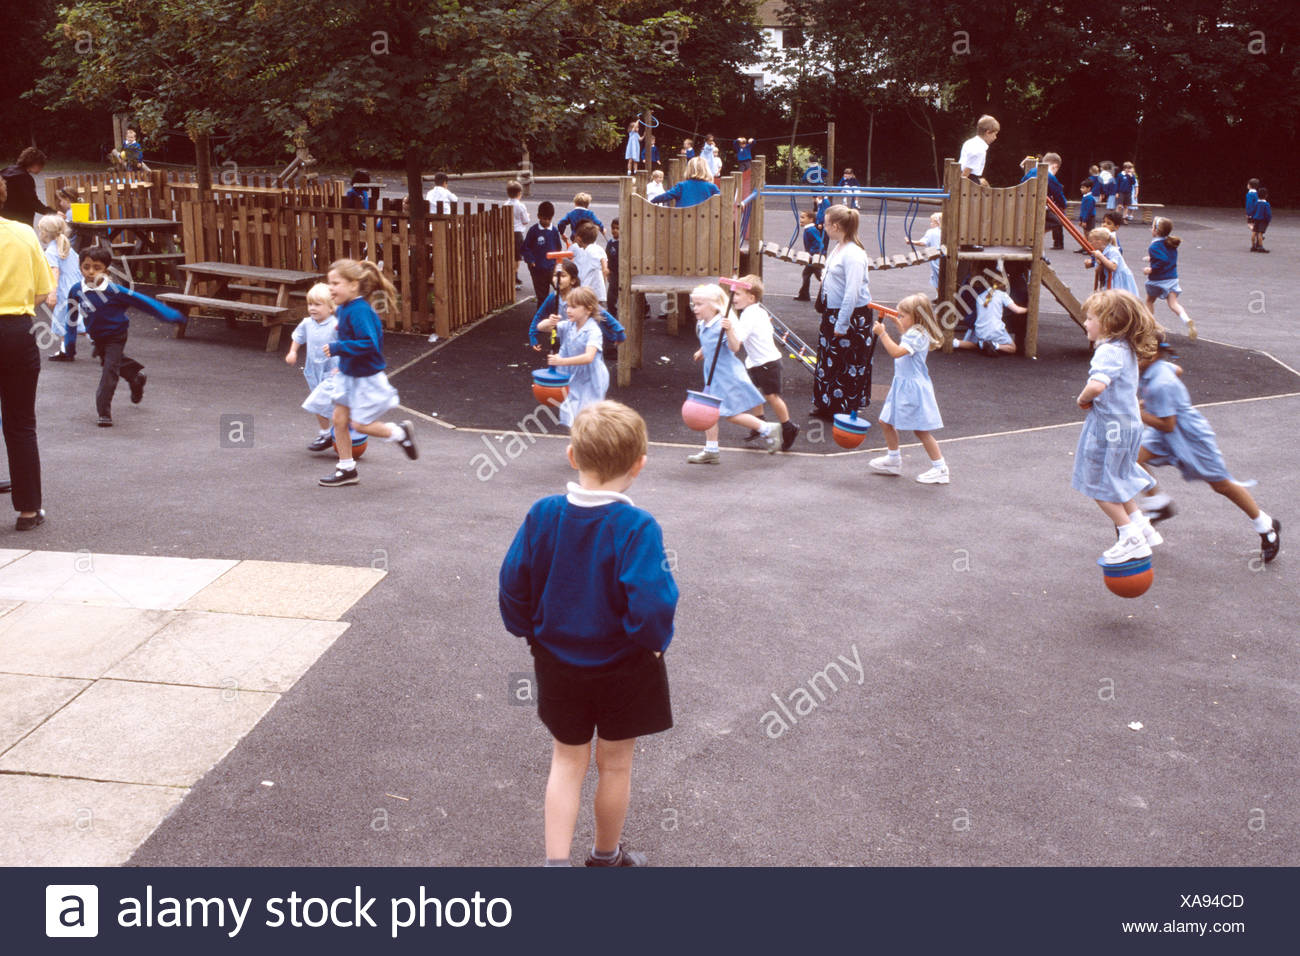 primary school children in the playground - Stock Image